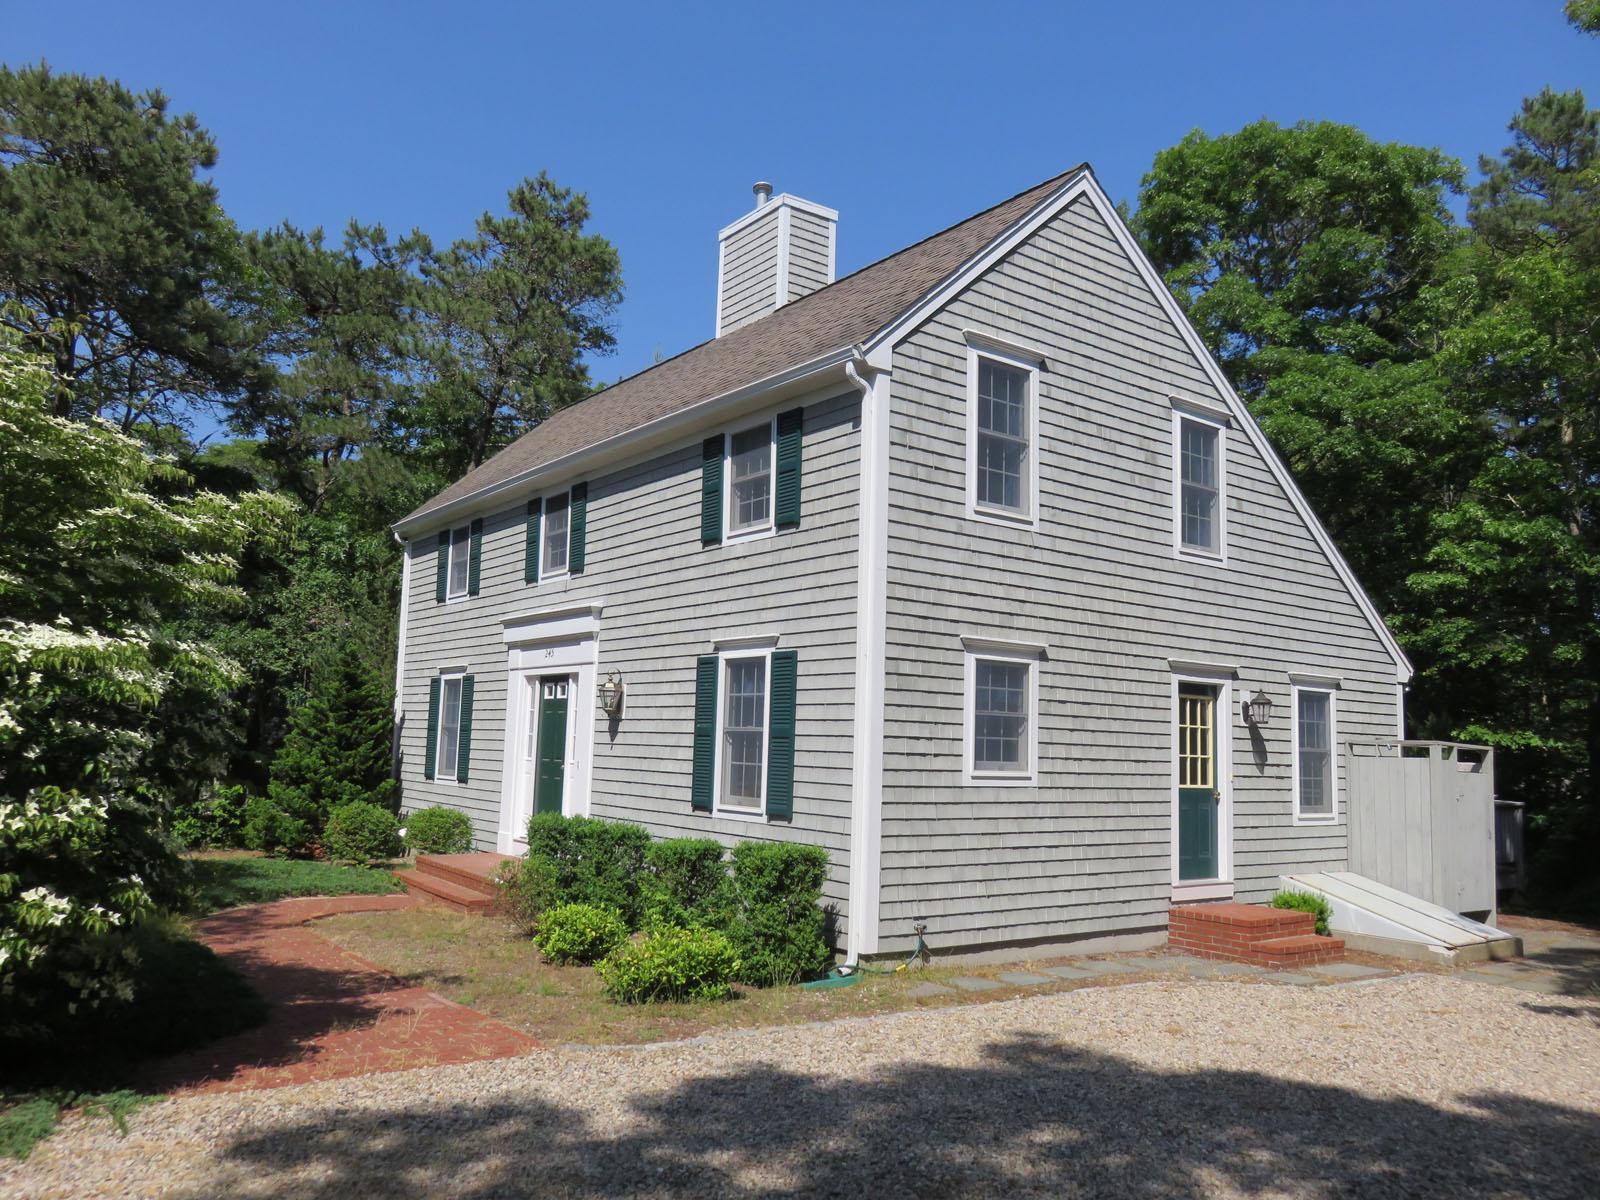 Single Family Home for Sale at CLOSE TO SWIM POND 245 Fells Pond Road New Seabury, Massachusetts, 02649 United States